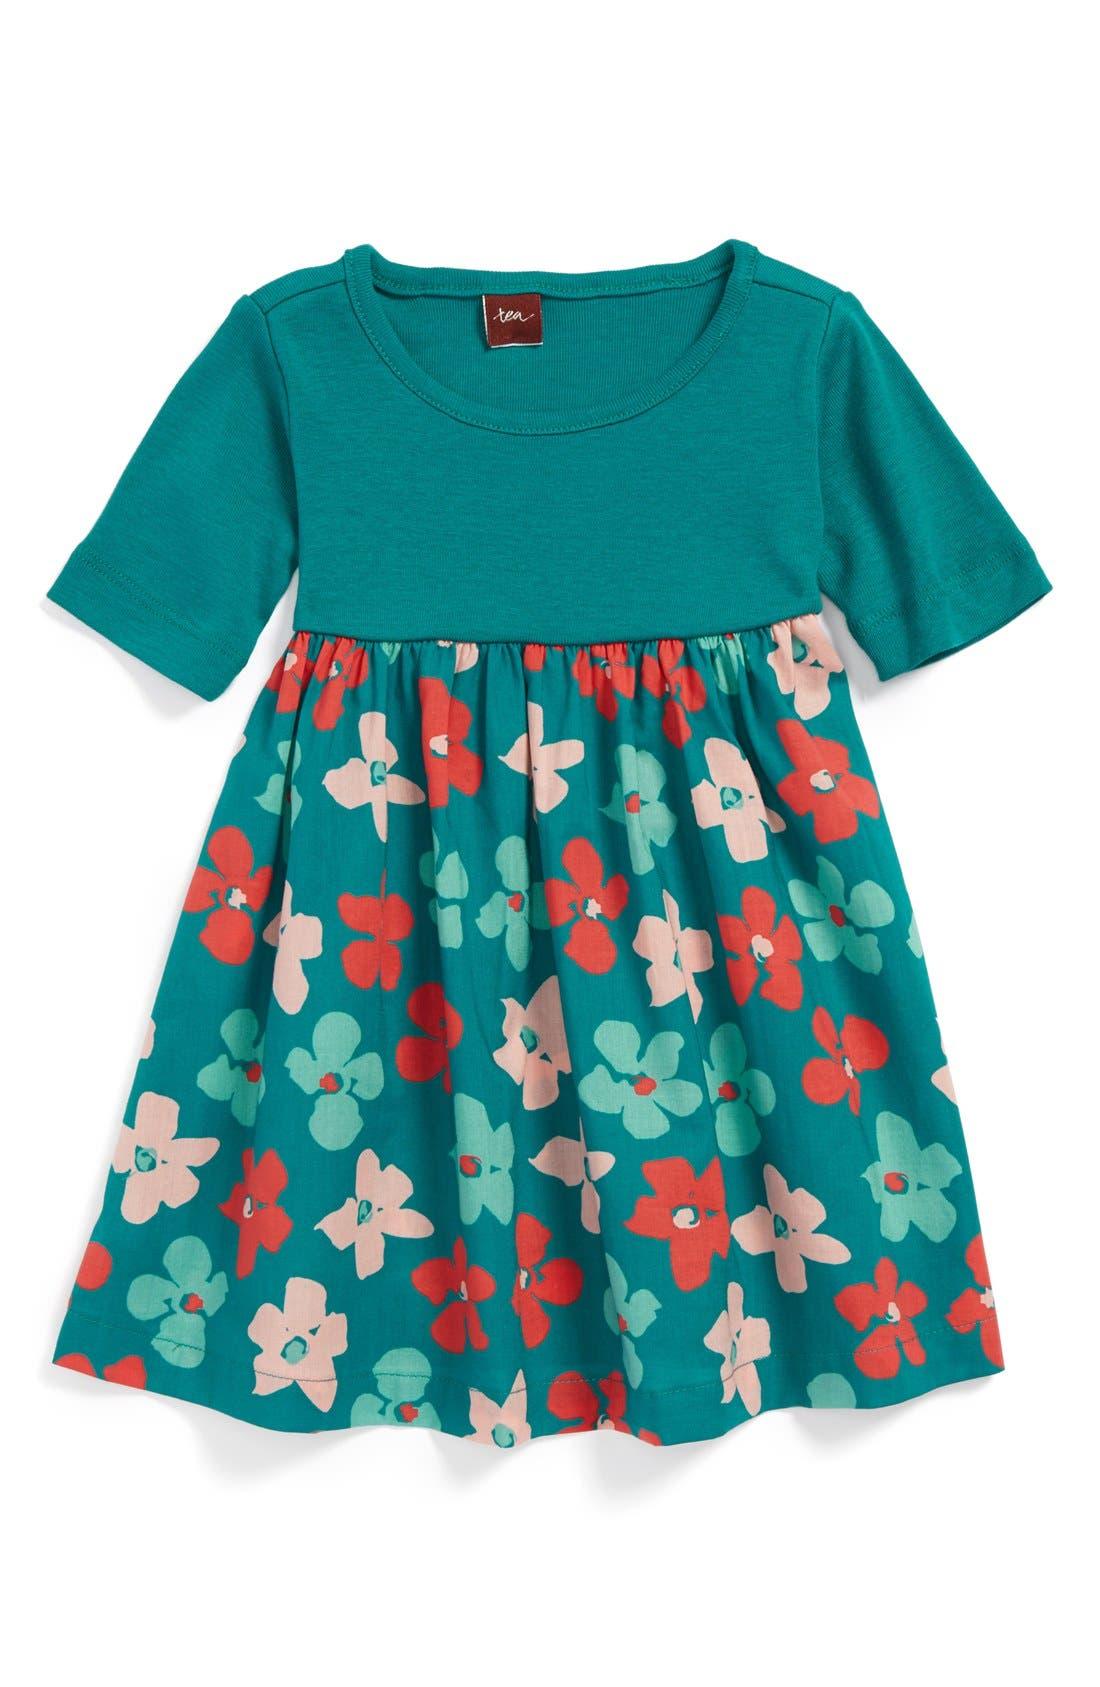 Alternate Image 1 Selected - Tea Collection 'Stiefmütterchen' Cotton Dress (Baby Girls)